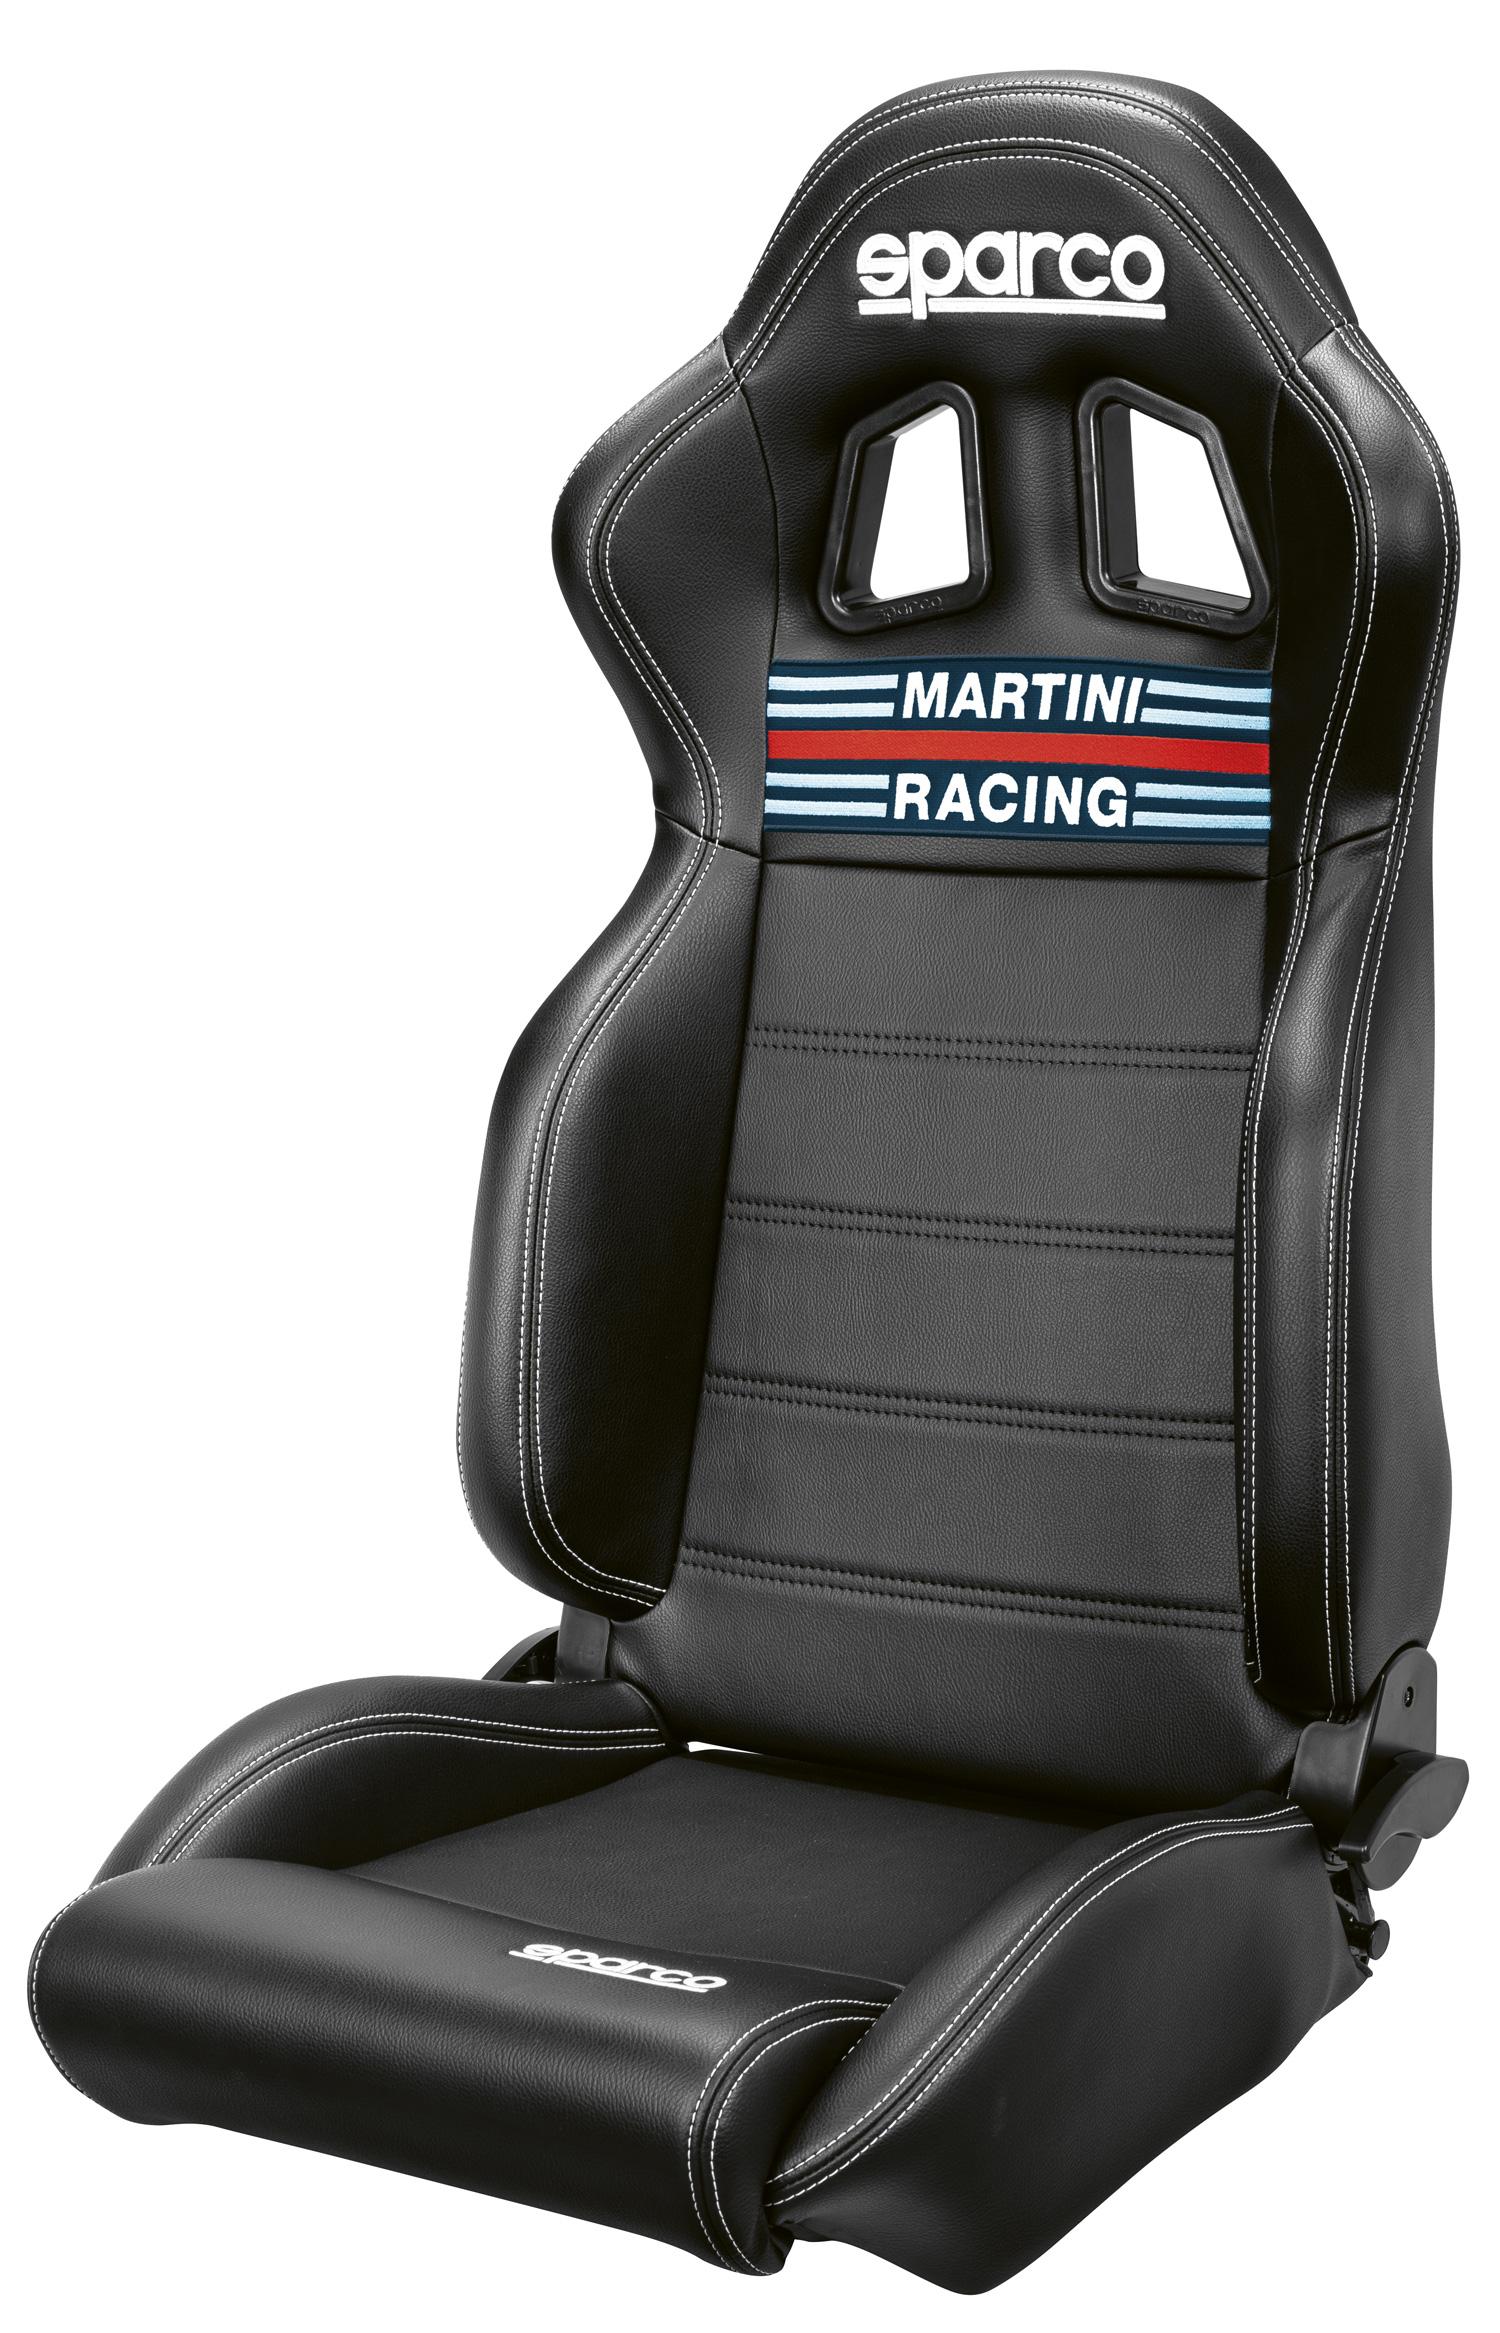 Sparco Sportsitz R100 Martini Racing